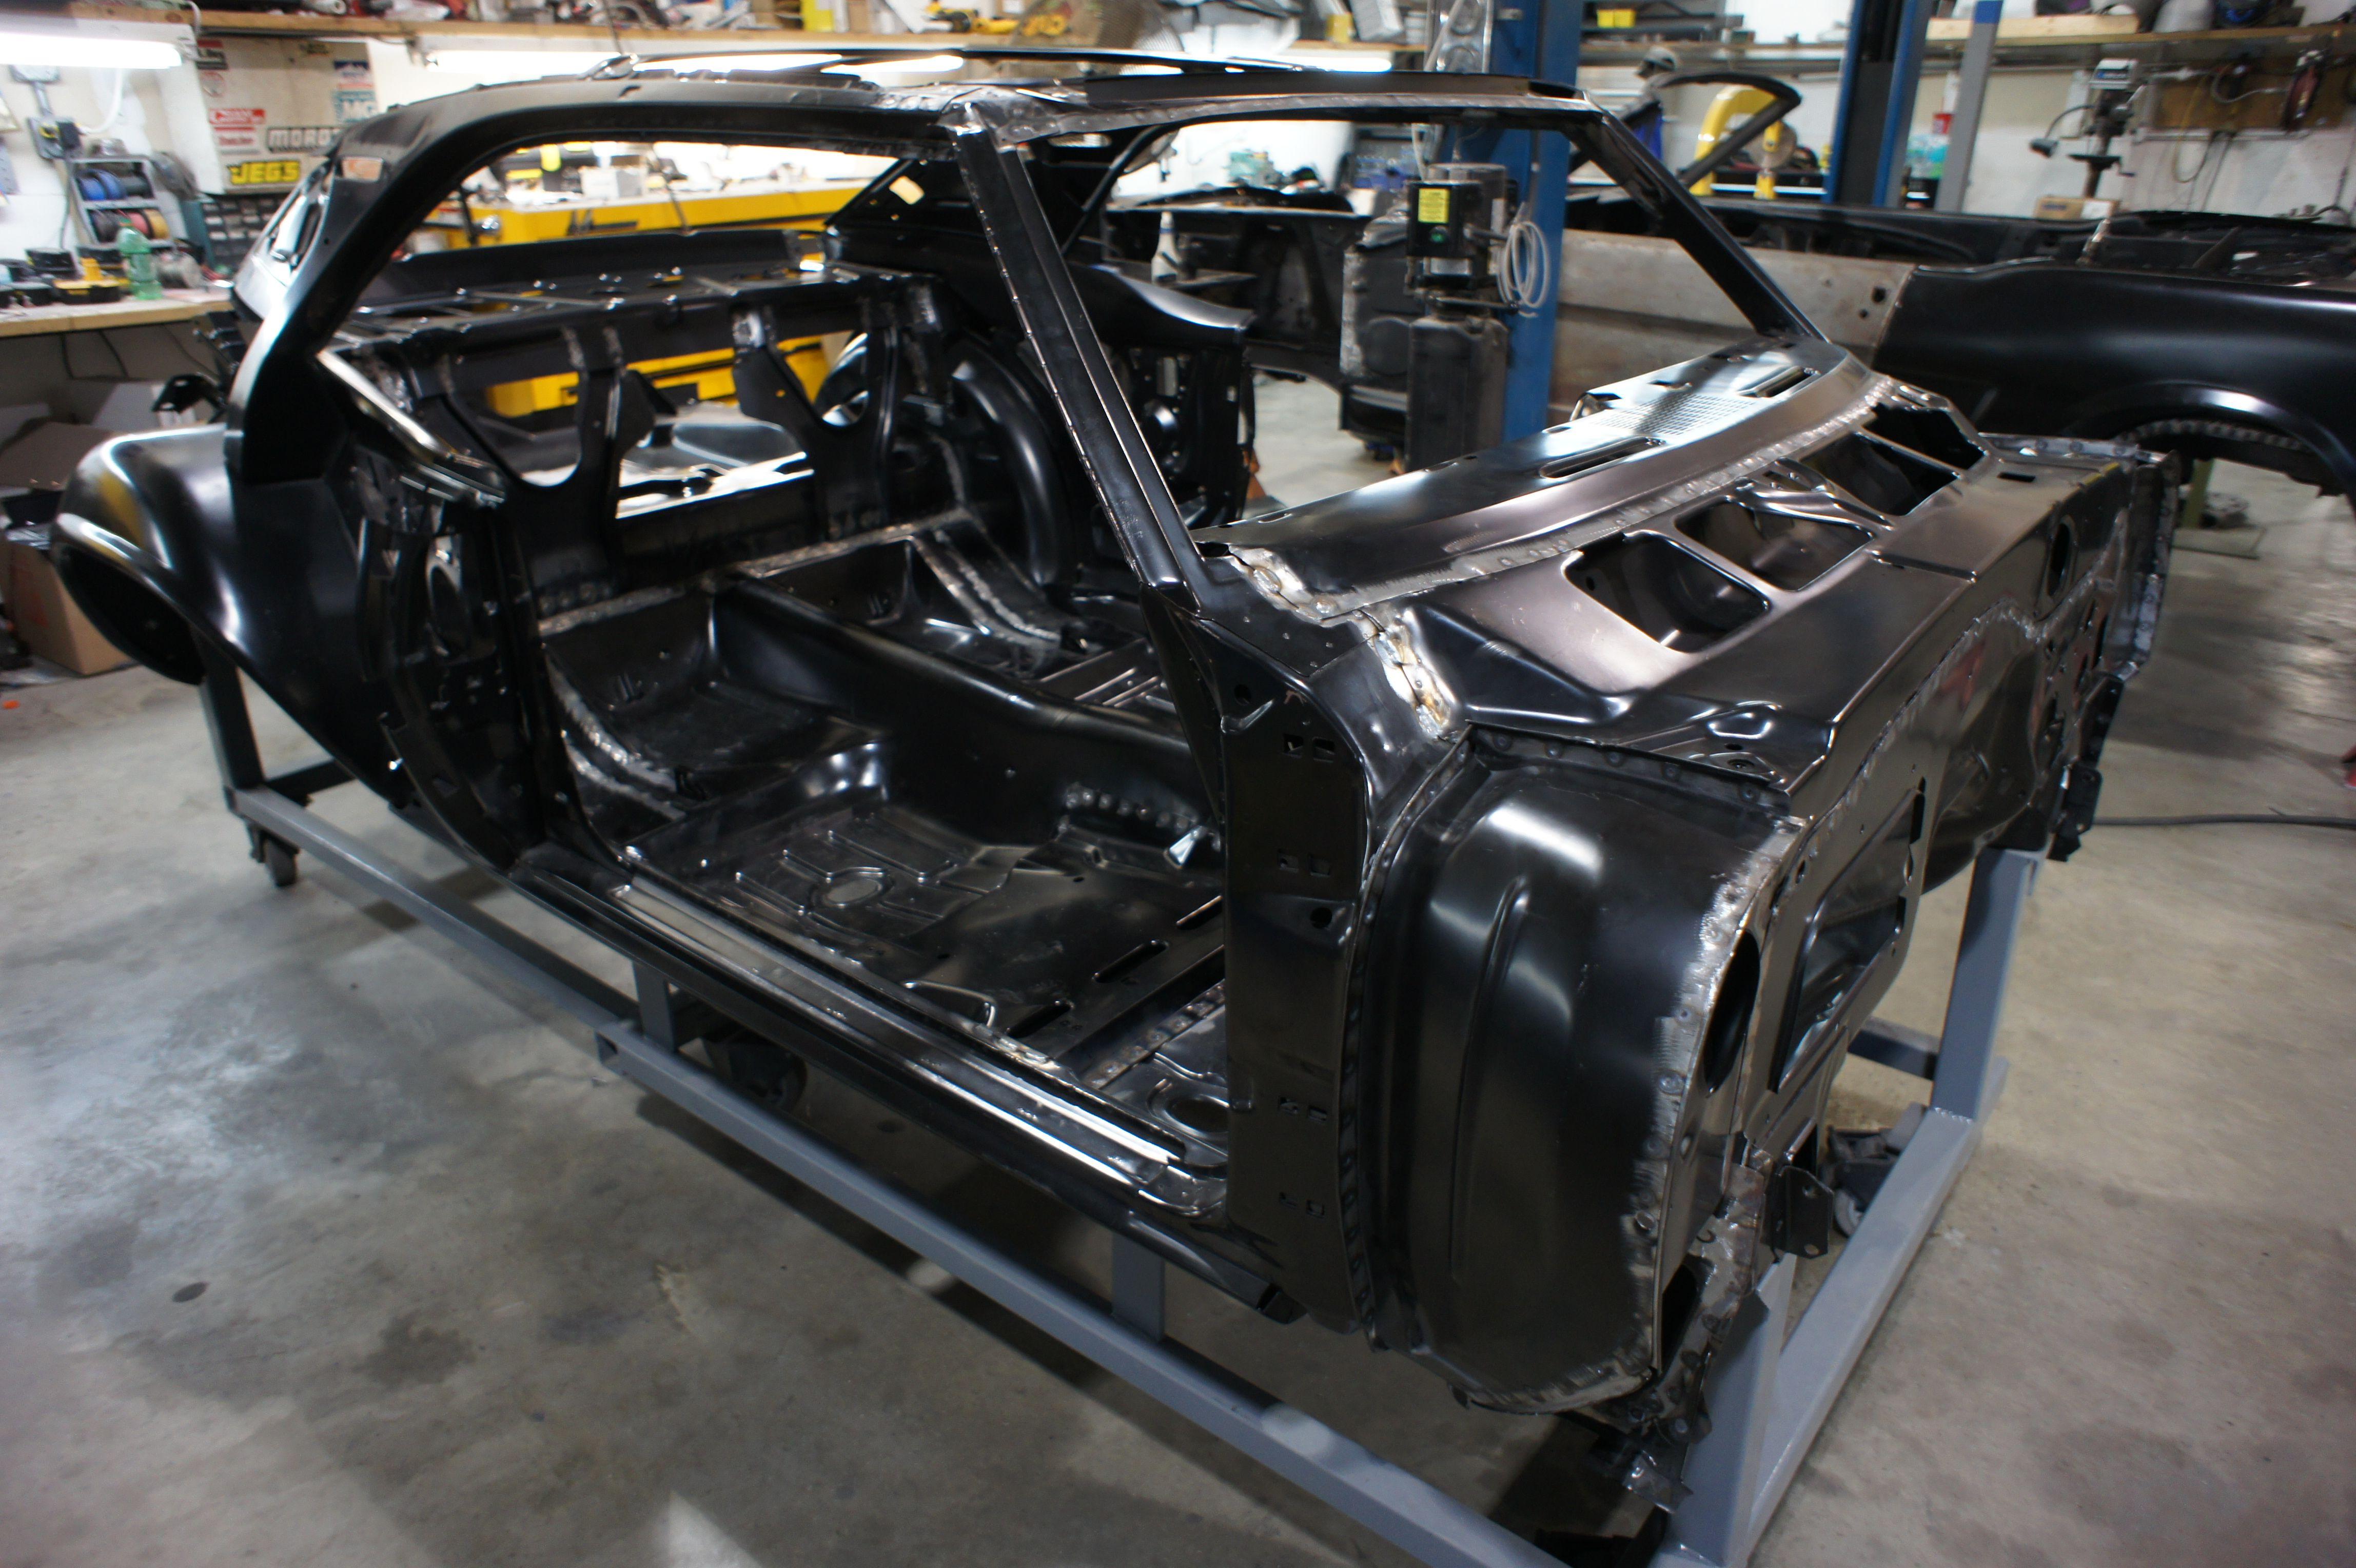 1969 Camaro Bodybuild resurrectionmusclecars RMC